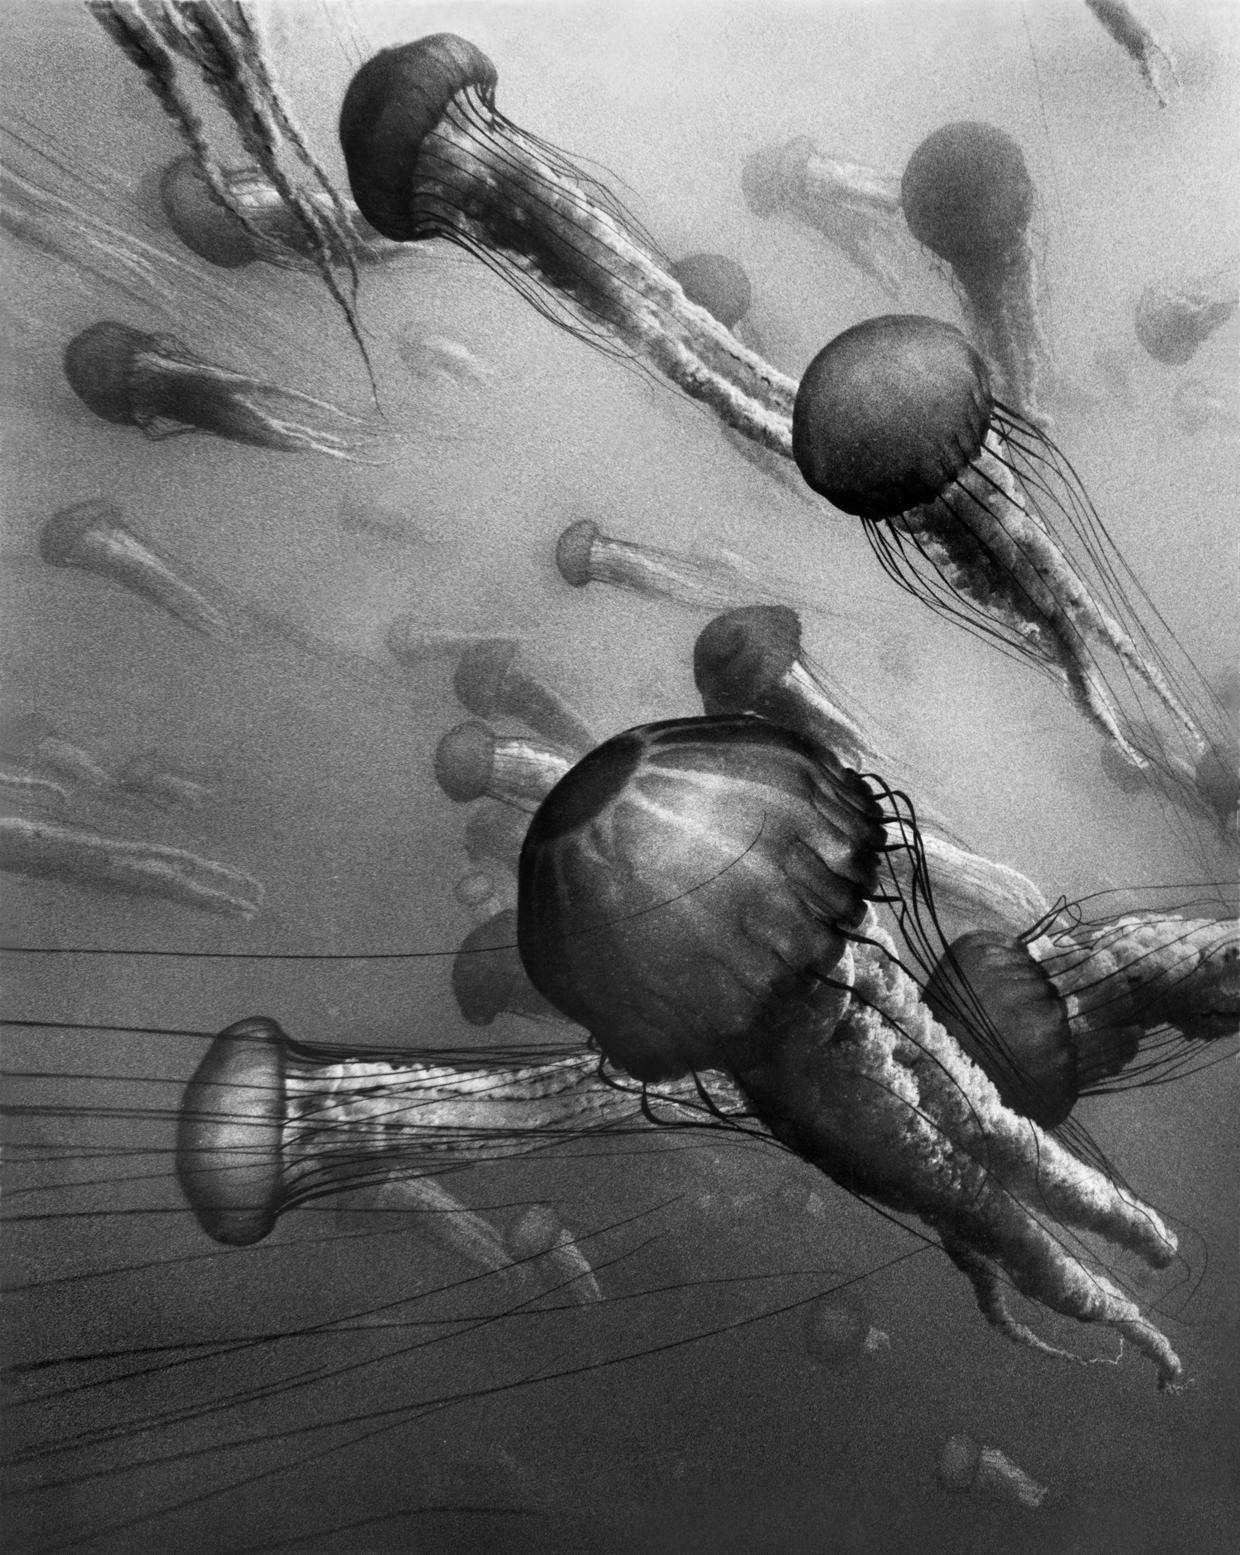 Sea Nettles #7, Point Lobos © Chuck Davis